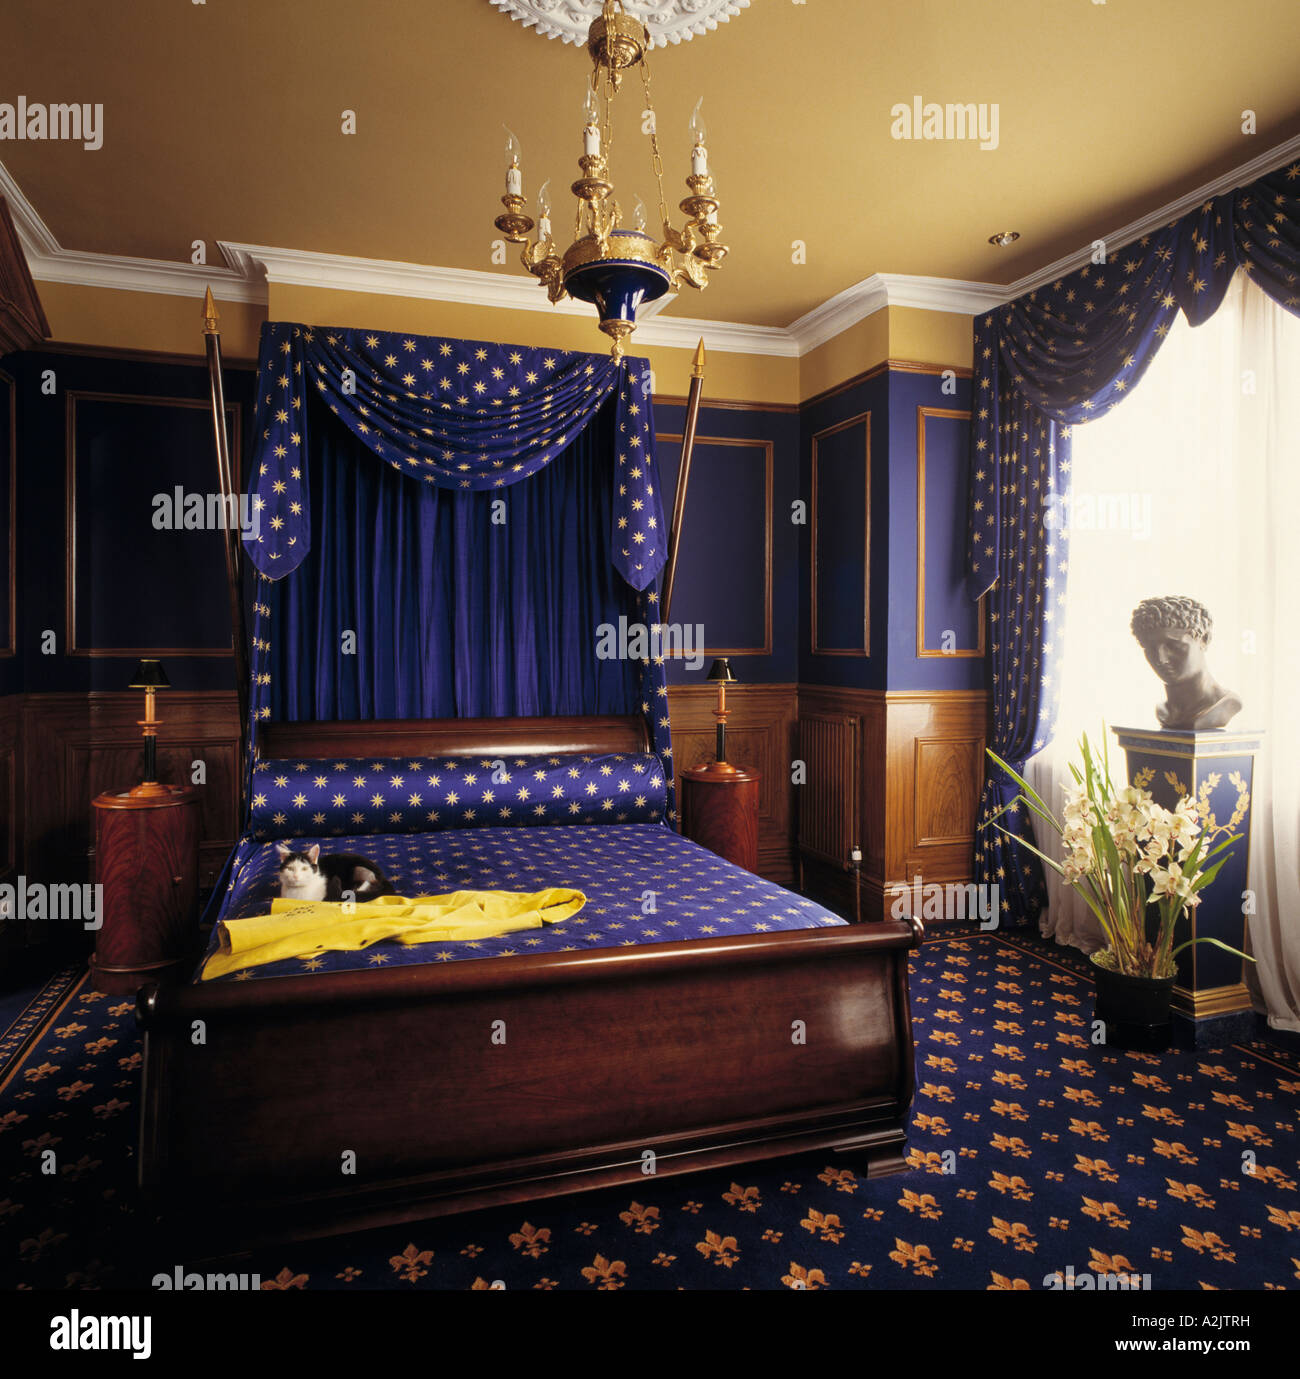 Camera da letto con pareti blu e blu moquette a motivi geometrici ...